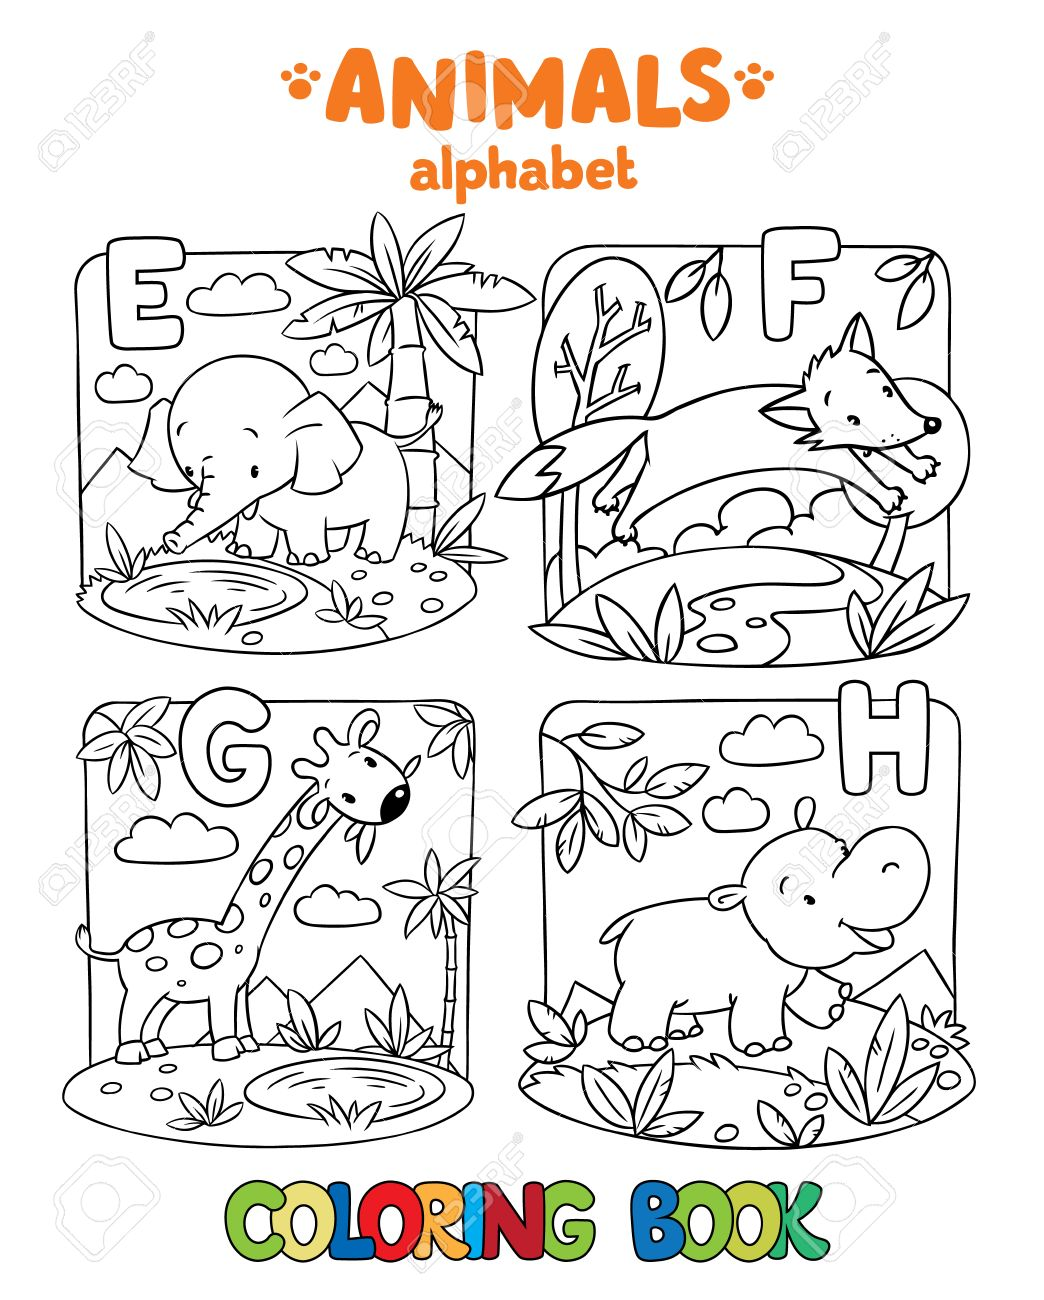 Libro Para Colorear O Dibujo Para Colorear De Elefante Divertido ...